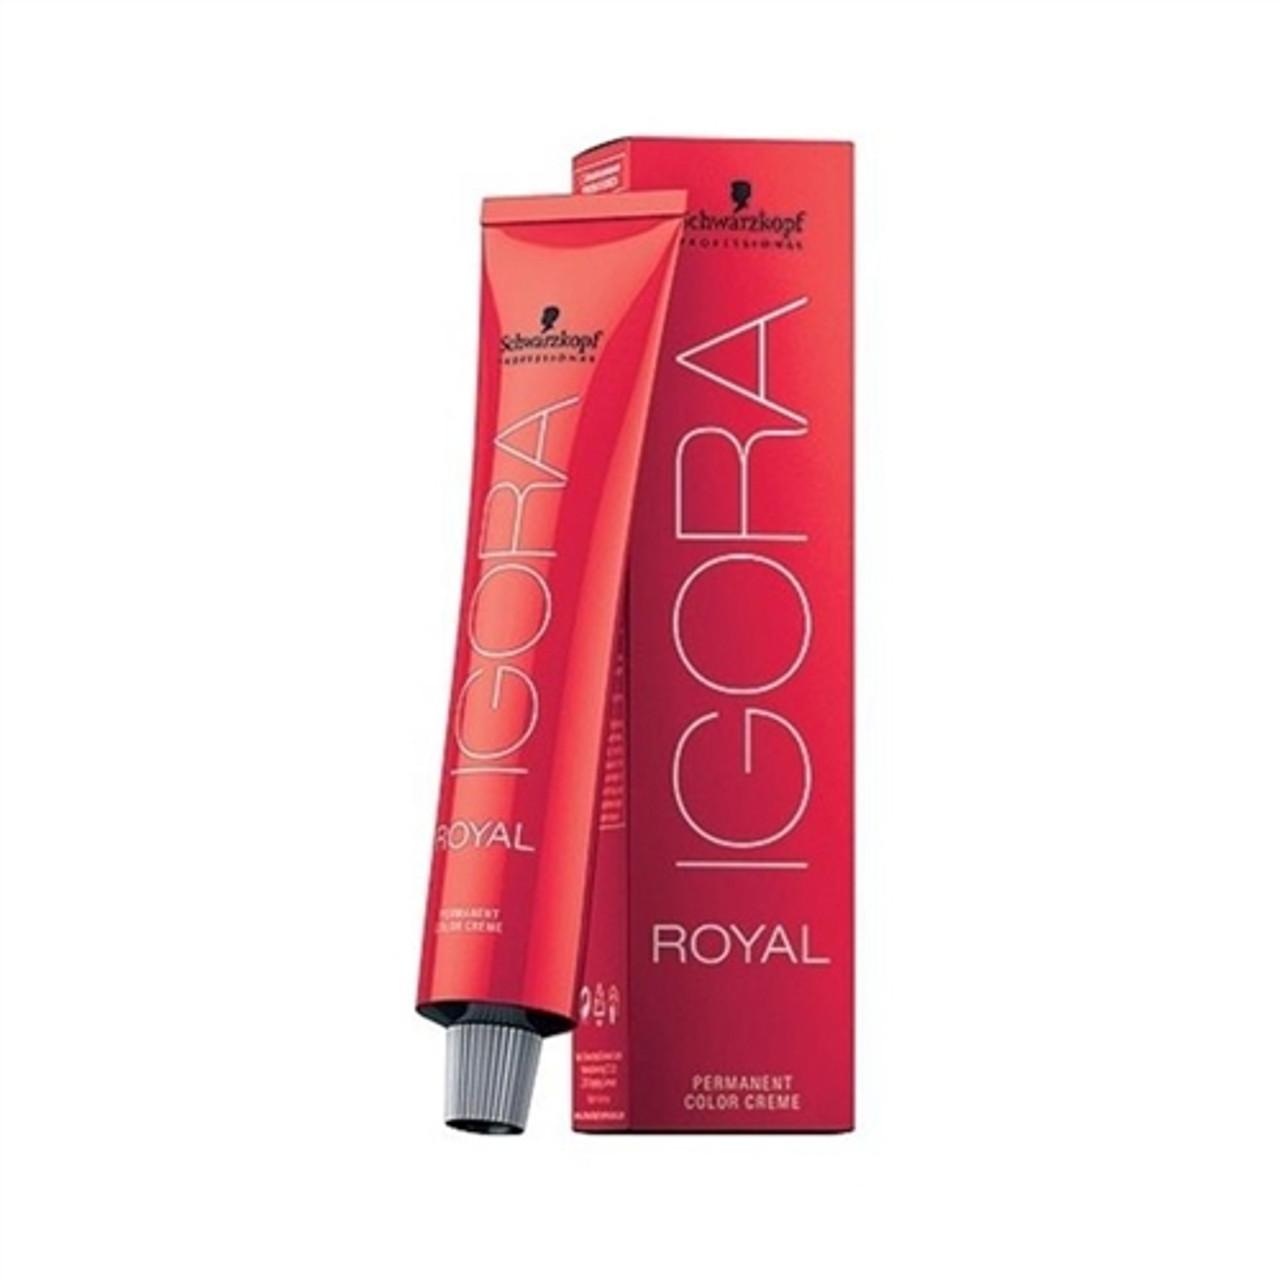 7-55 Medium blondee Gold Extra Igora Royal Permanent Color Creme -